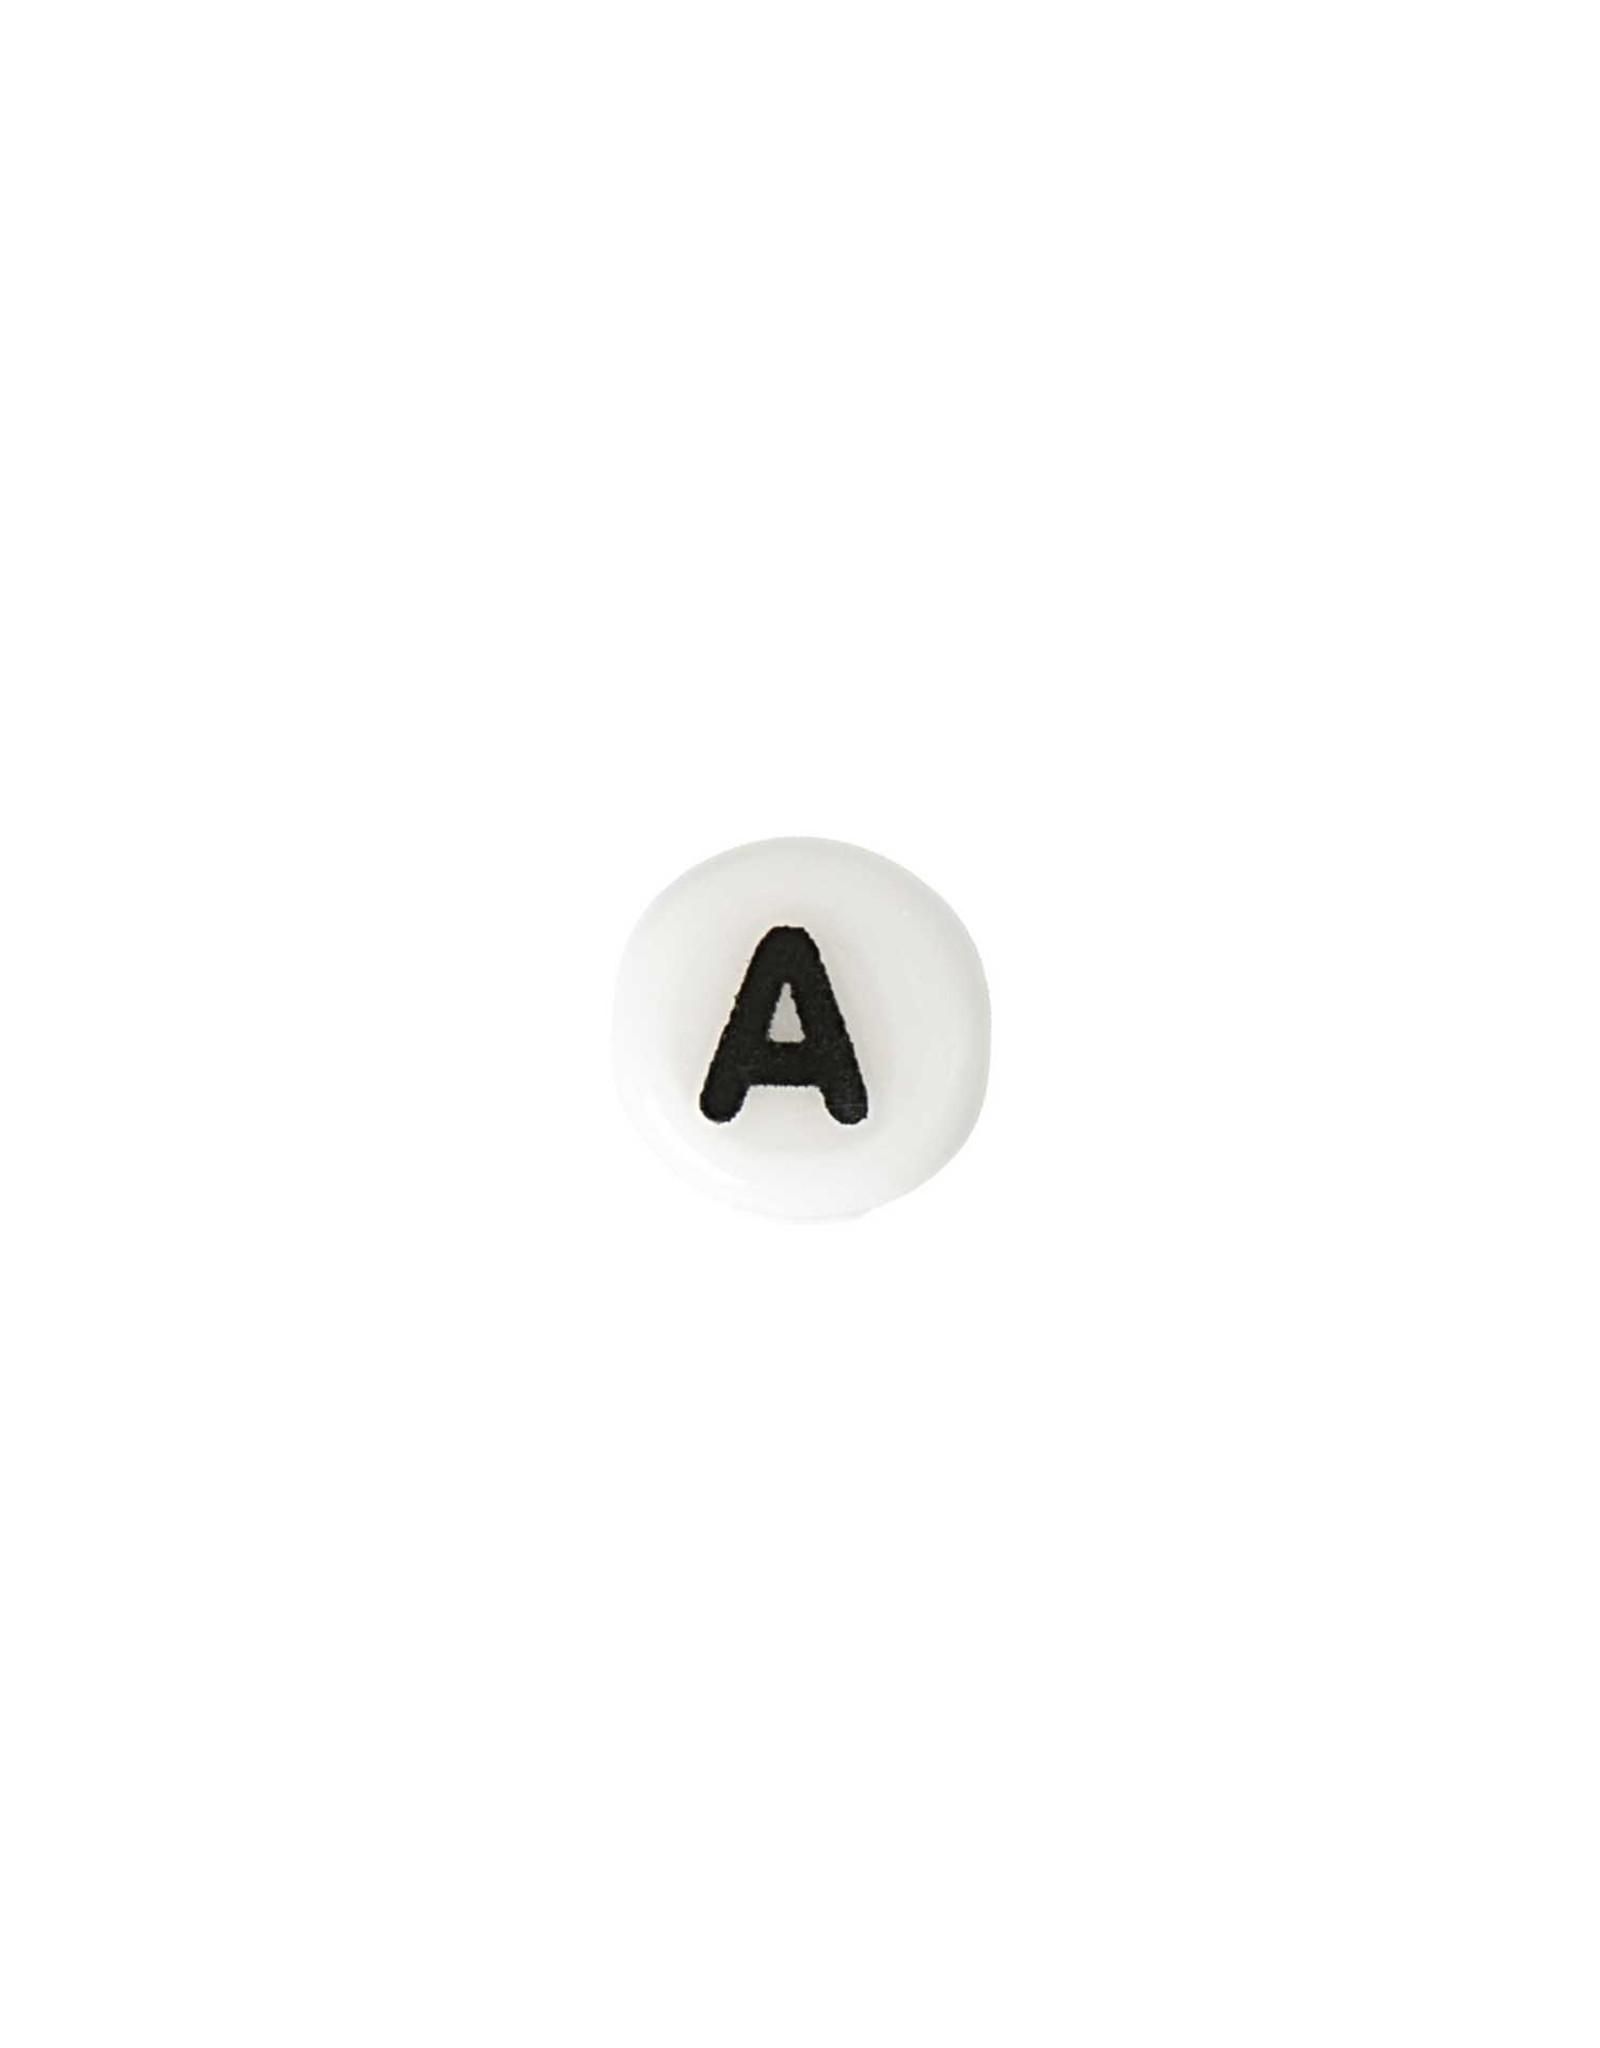 Rico Design Keramisch letters wit 8 x4mm rond kralen